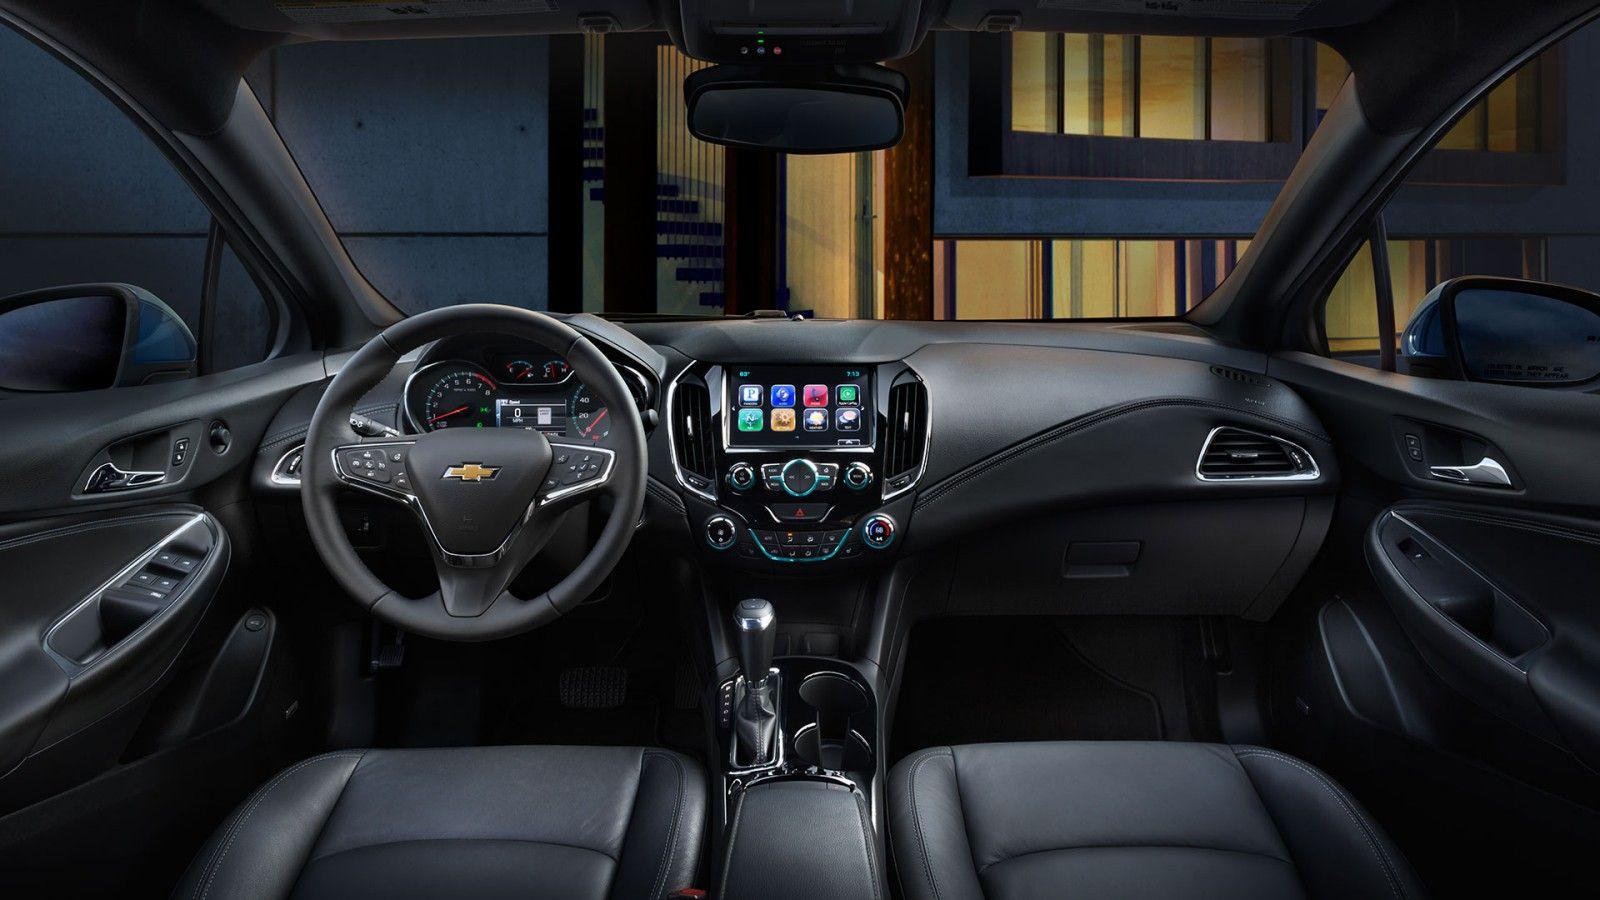 2017 Cruze Compact Car Interior Pit